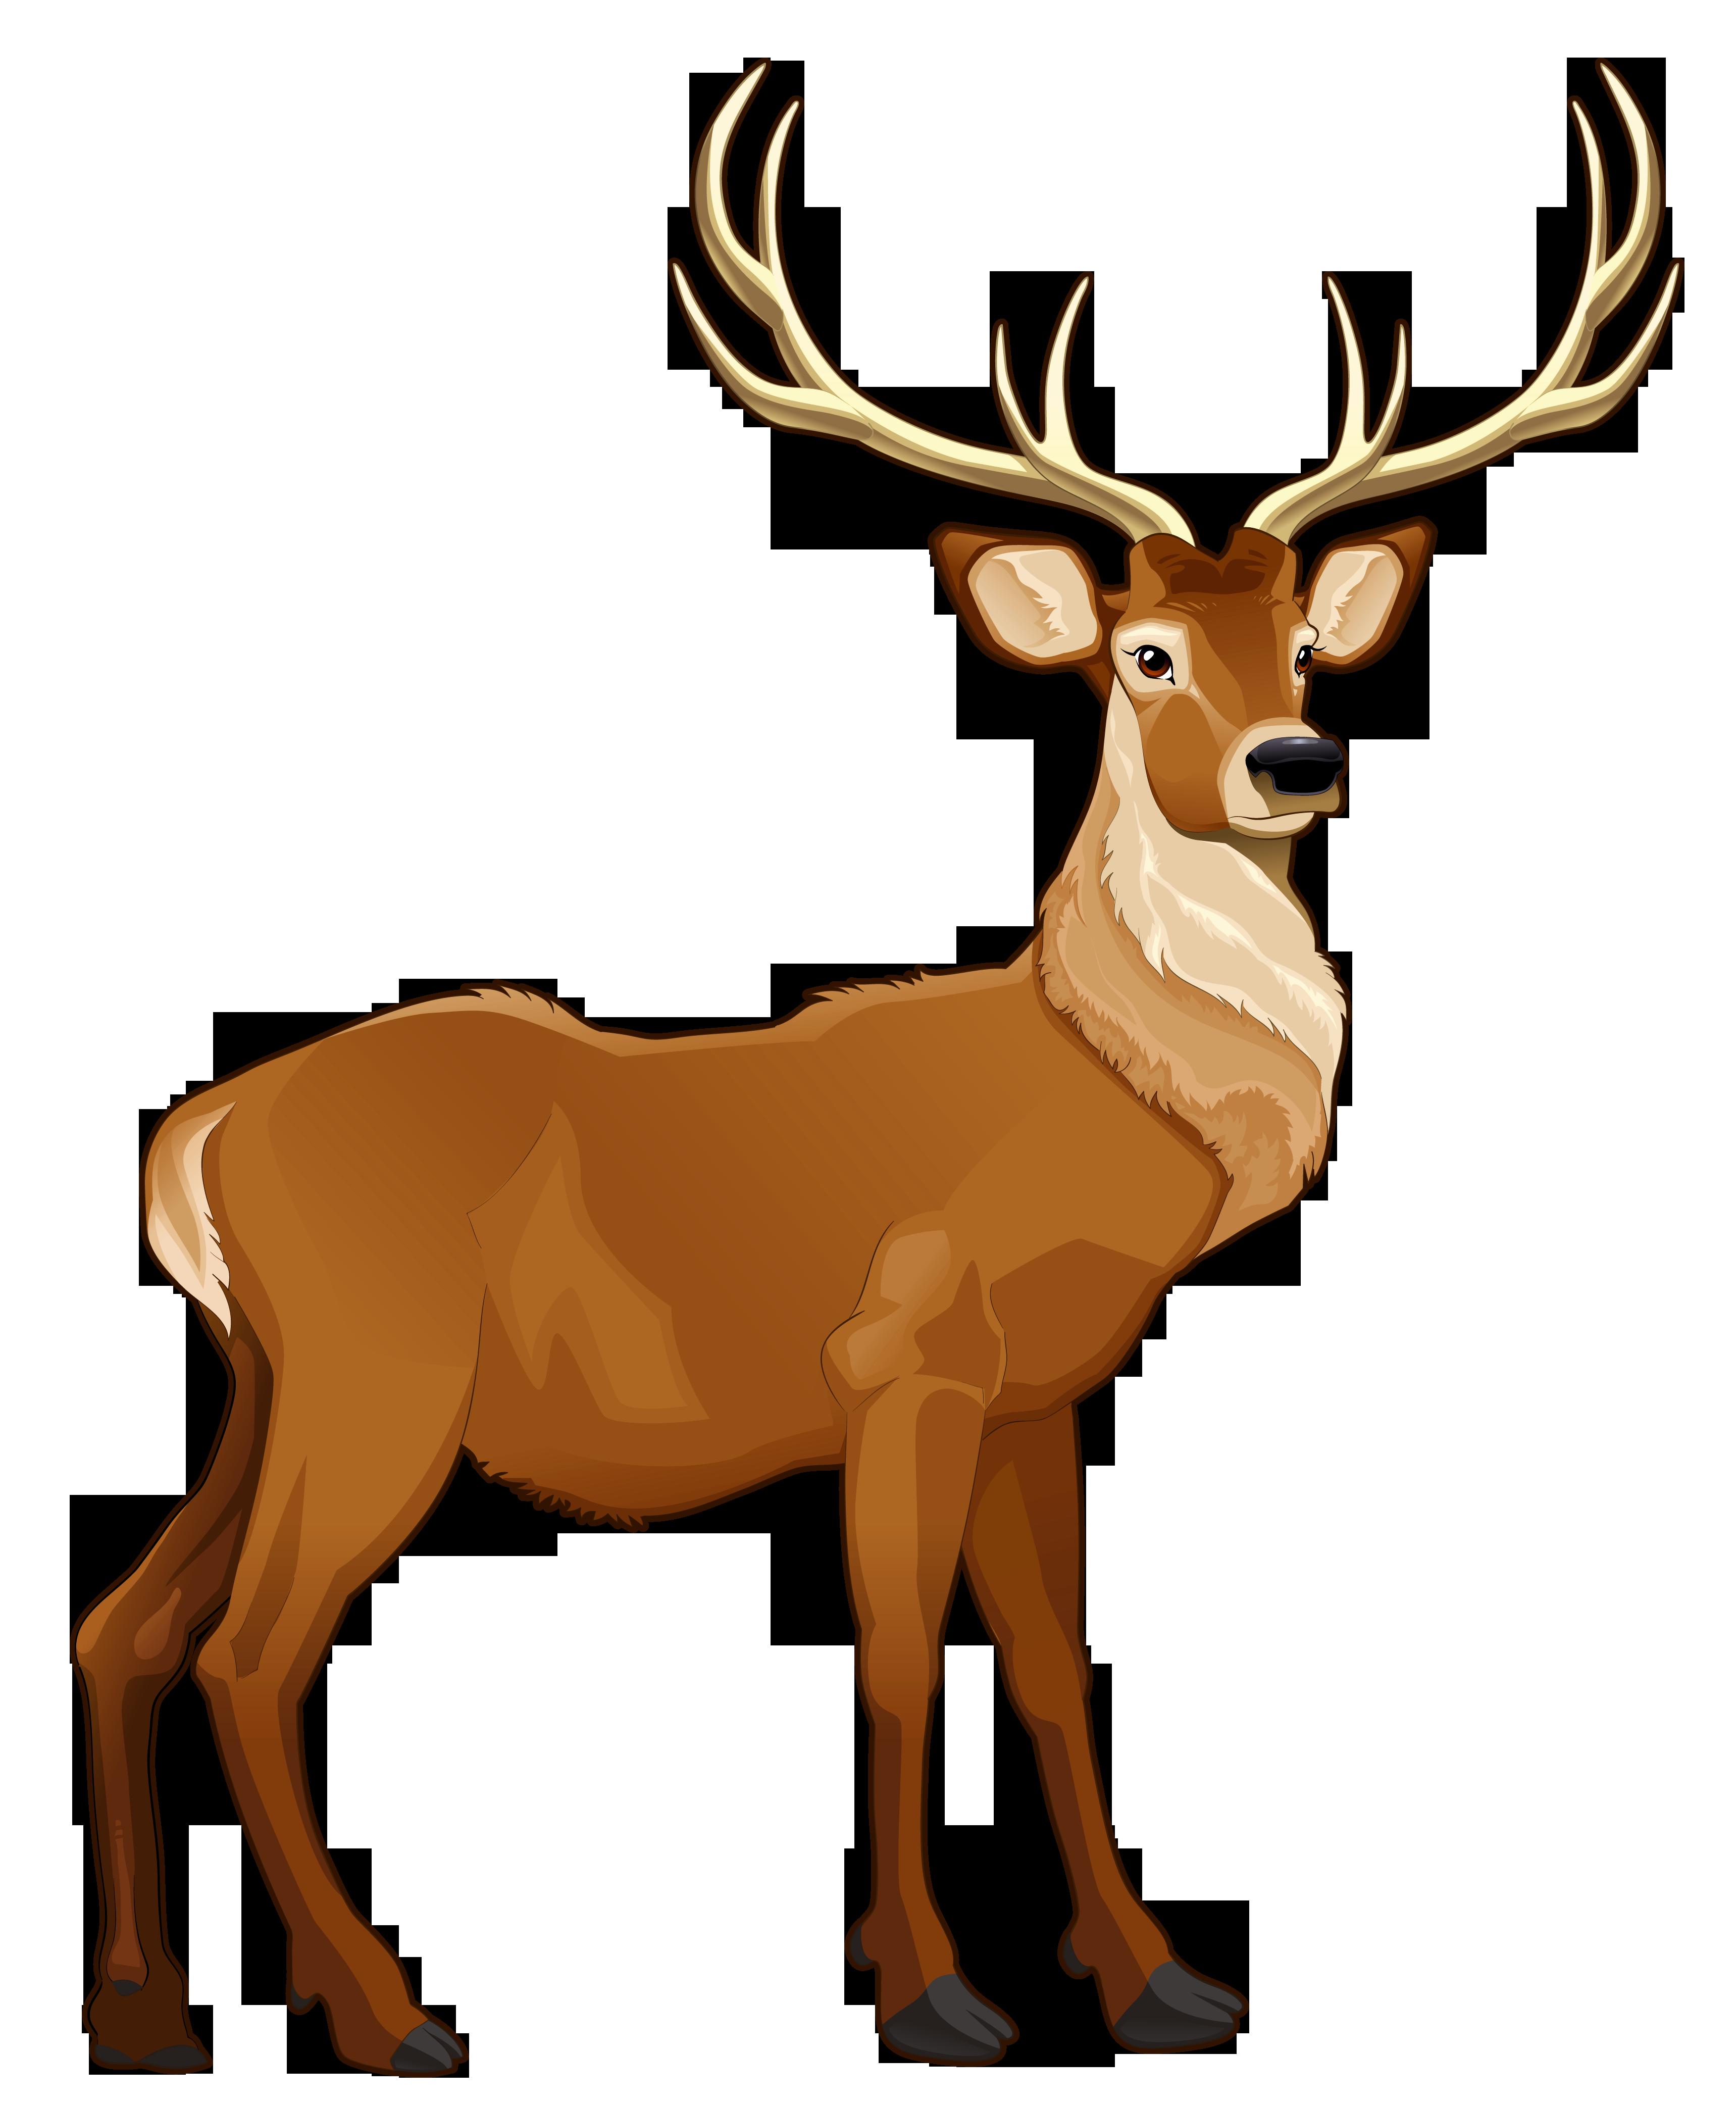 Deer clipart profile. Brown reindeer png picture